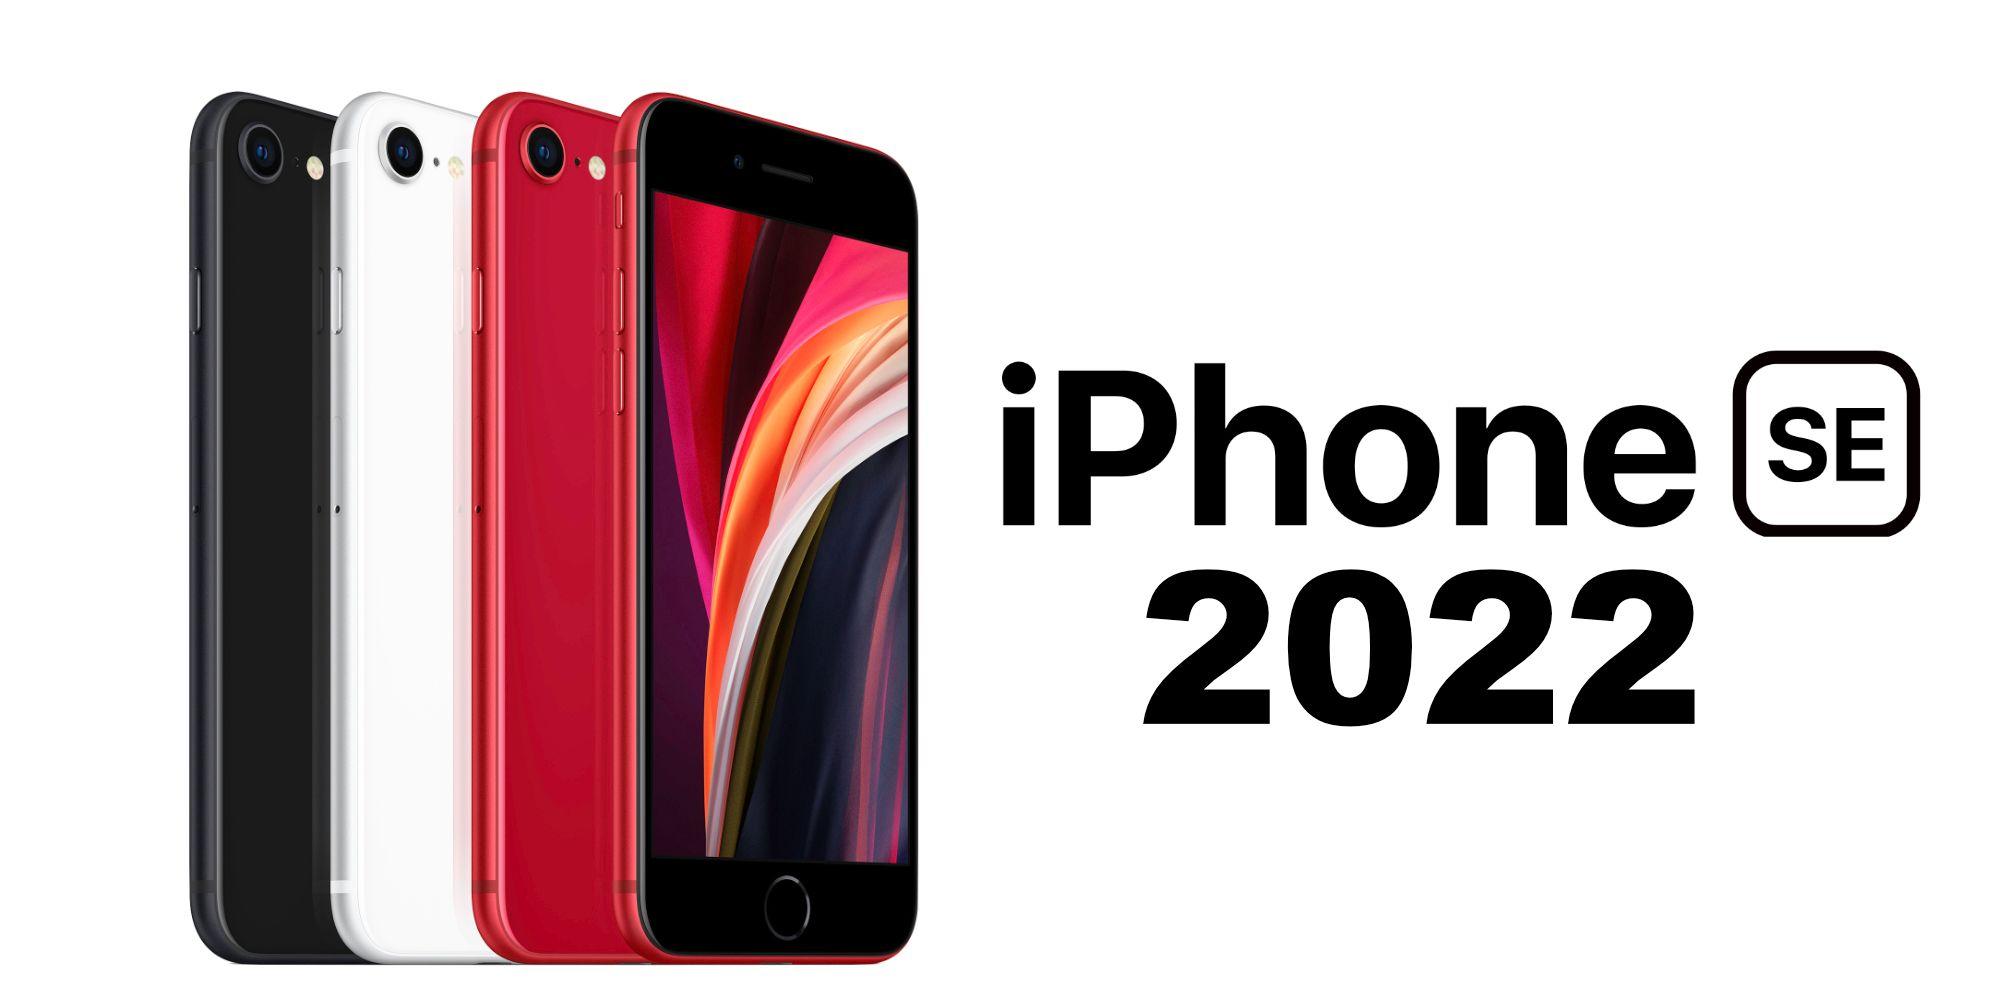 iPhone SE 2022 Release Date